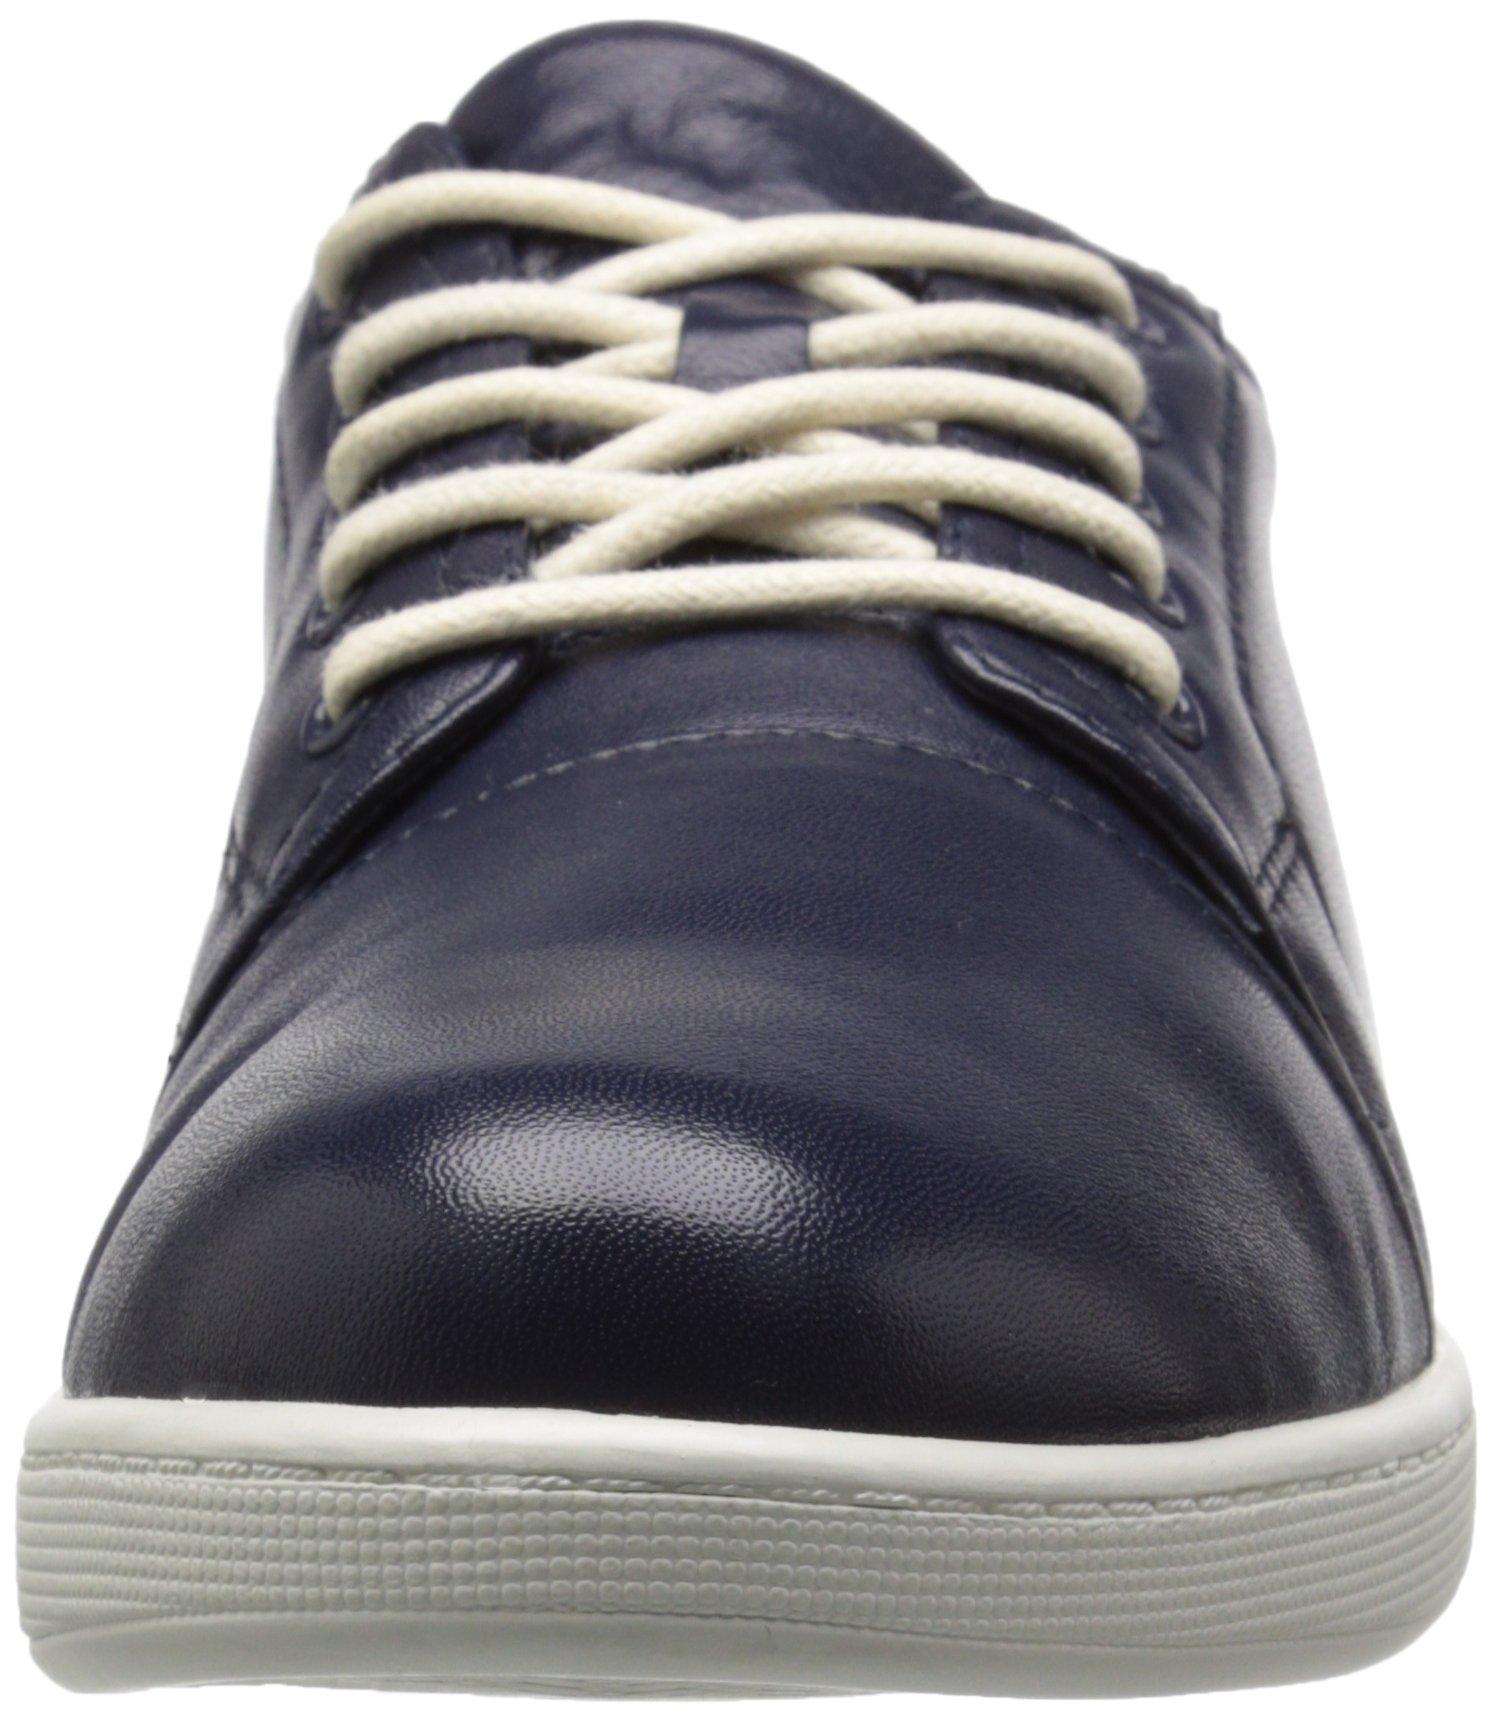 Trotters Women's Arizona Sneaker, Navy, 9 M US by Trotters (Image #4)